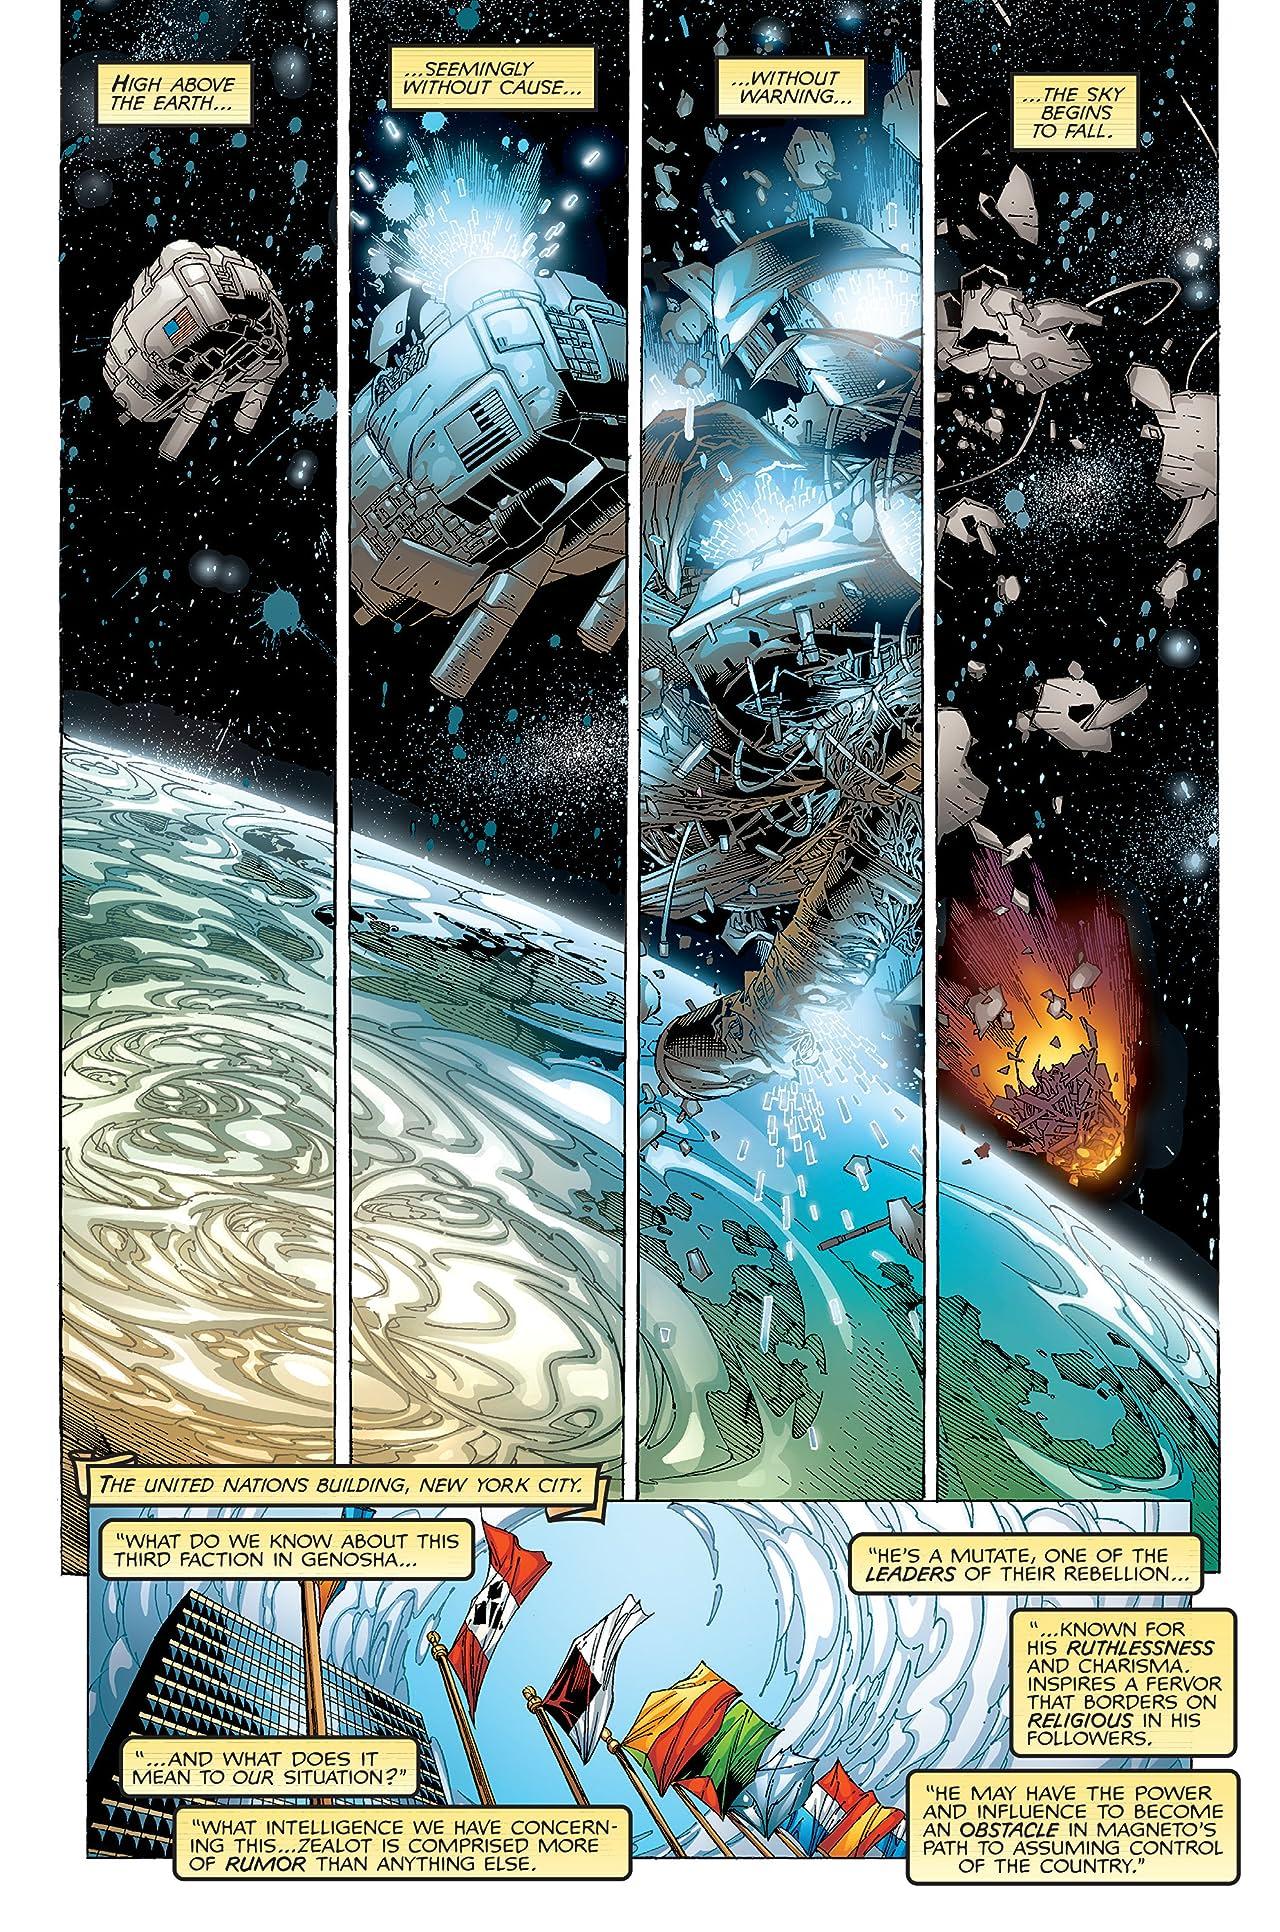 Magneto Rex (1999) #2 (of 3)